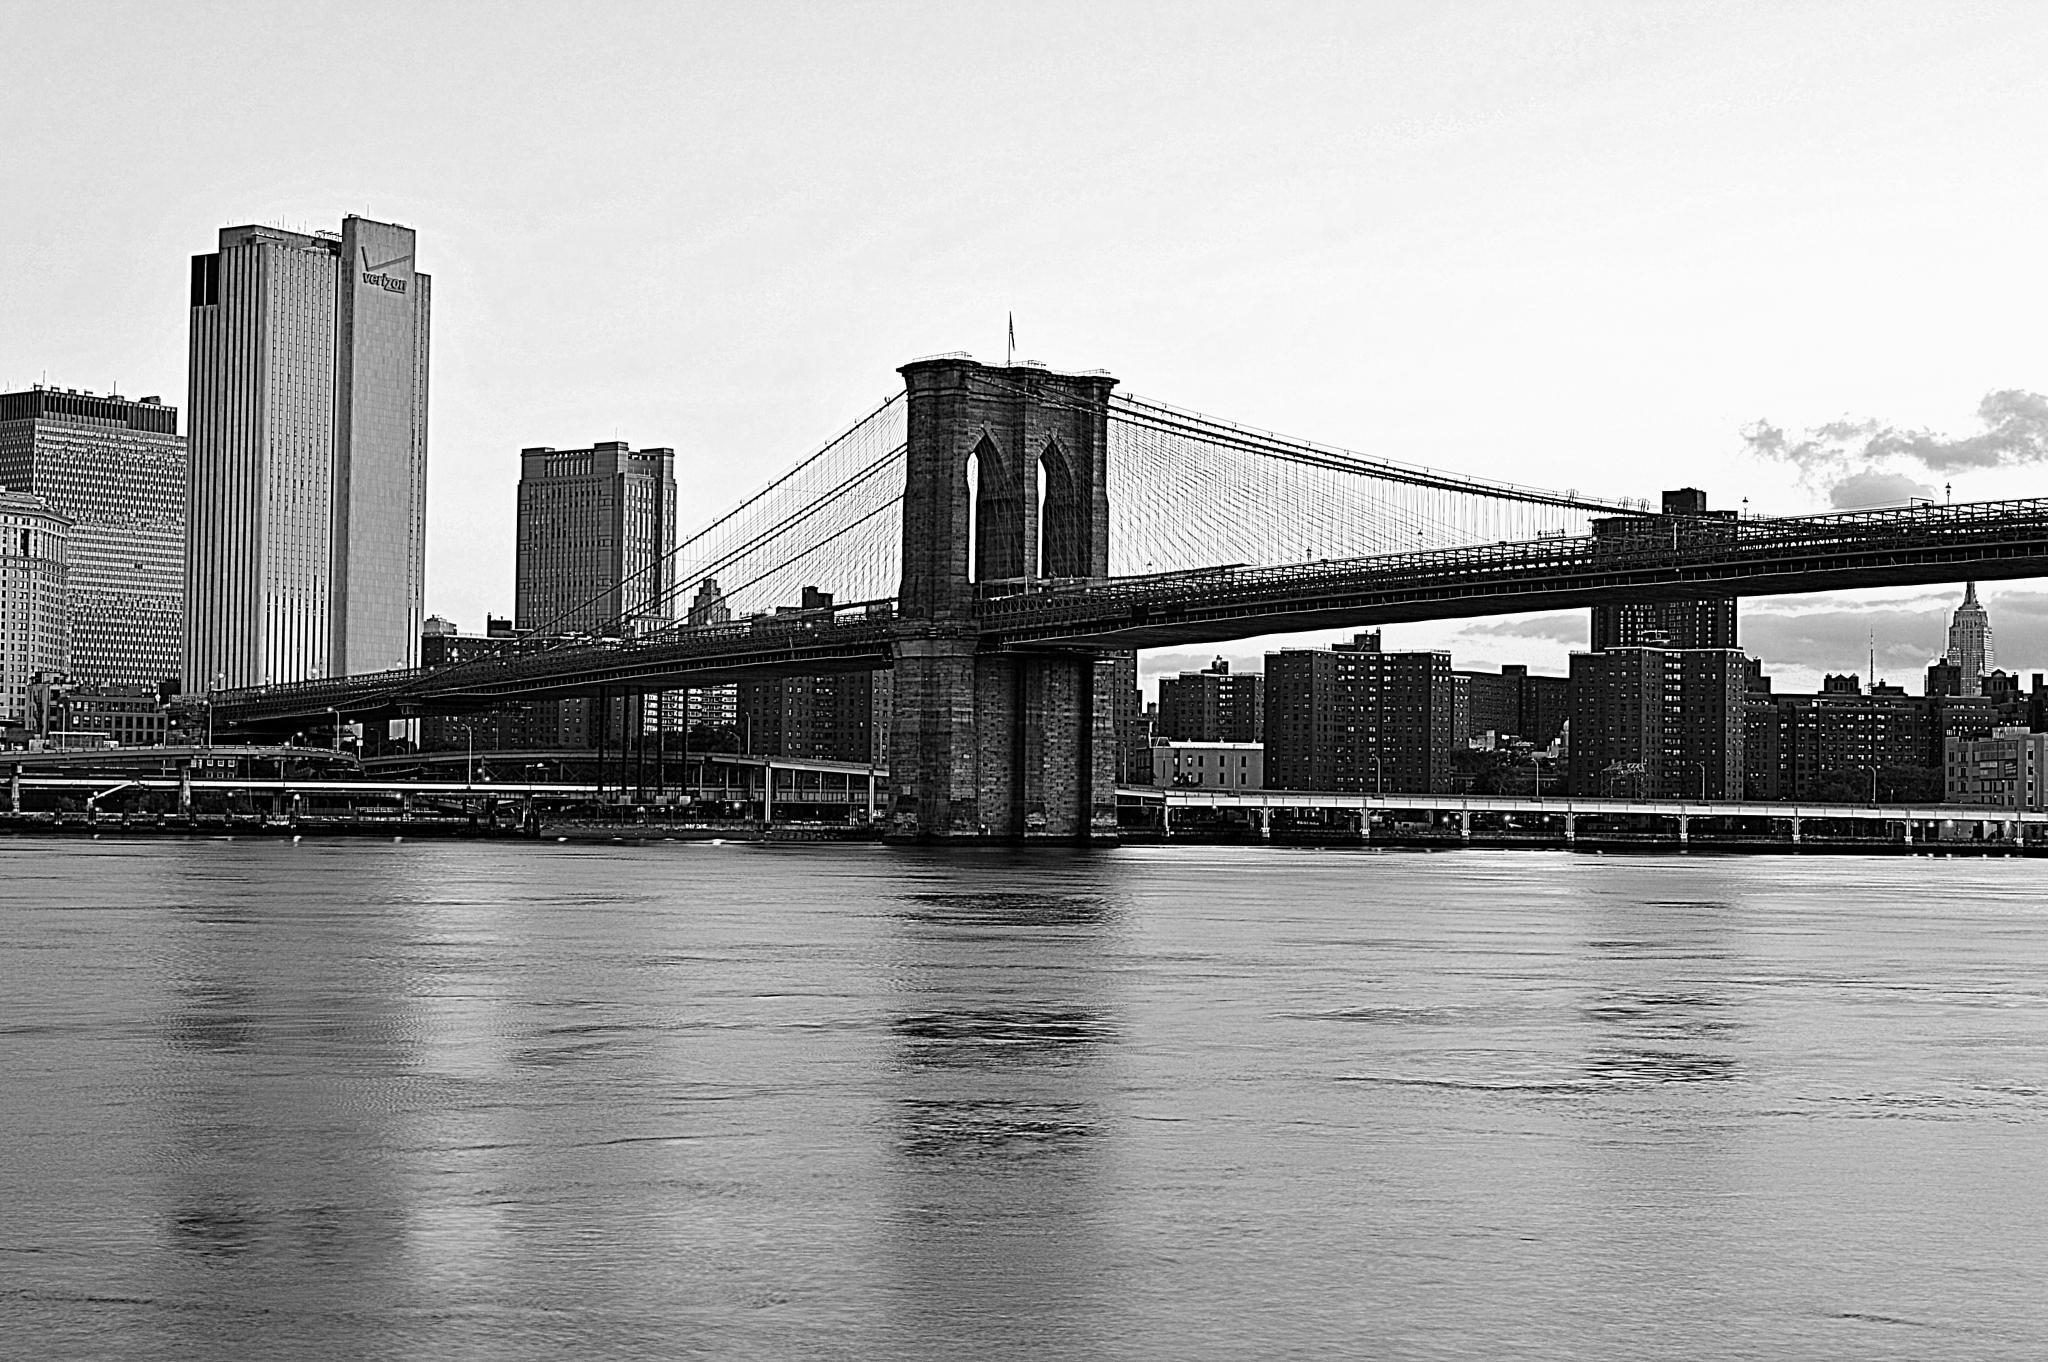 Manhattan Bidge. by Andrew Piekut